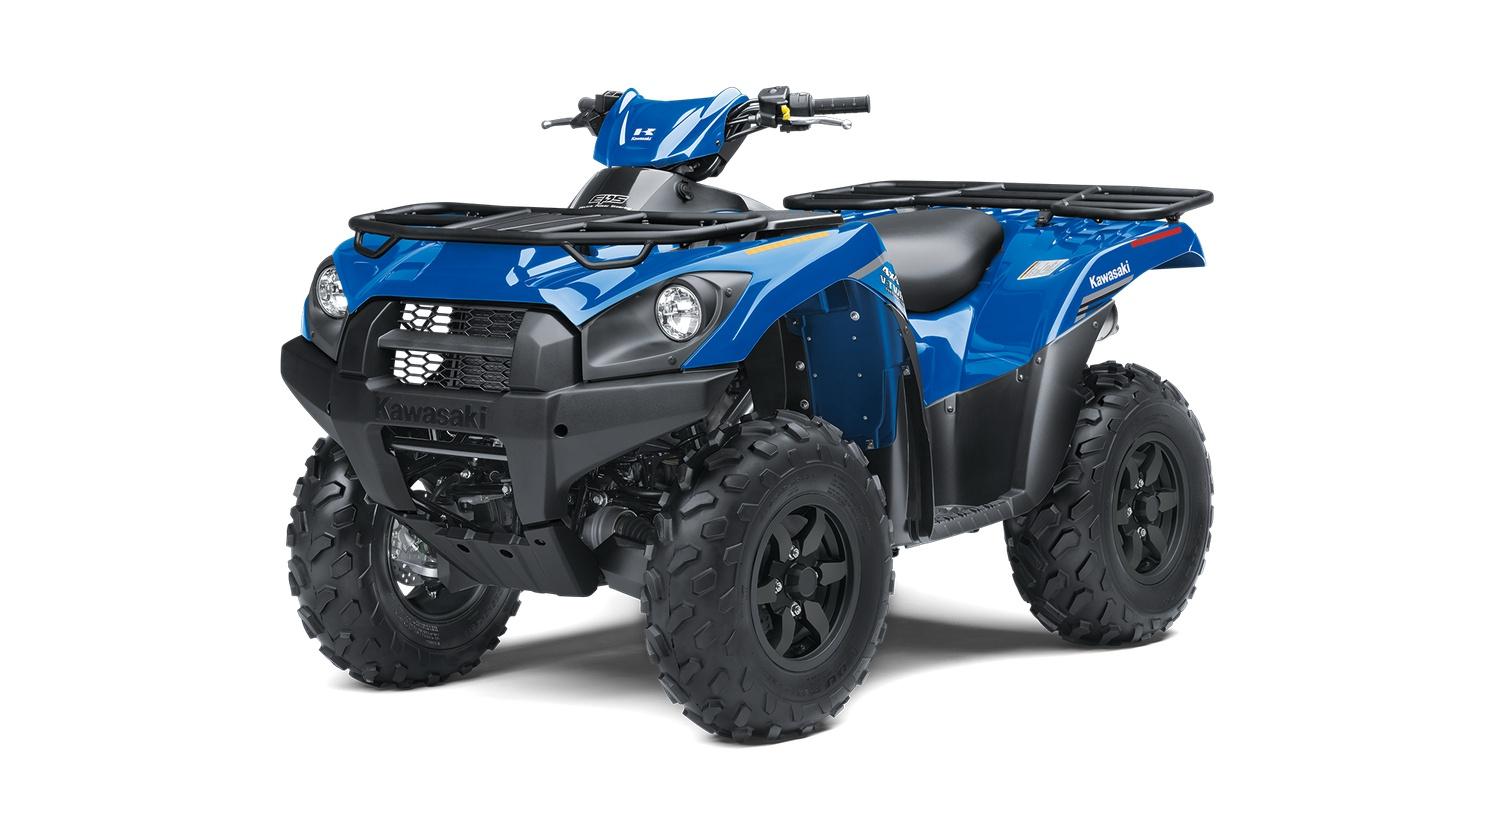 2020 Kawasaki BRUTE FORCE 750 4x4i EPS Vibrant Blue